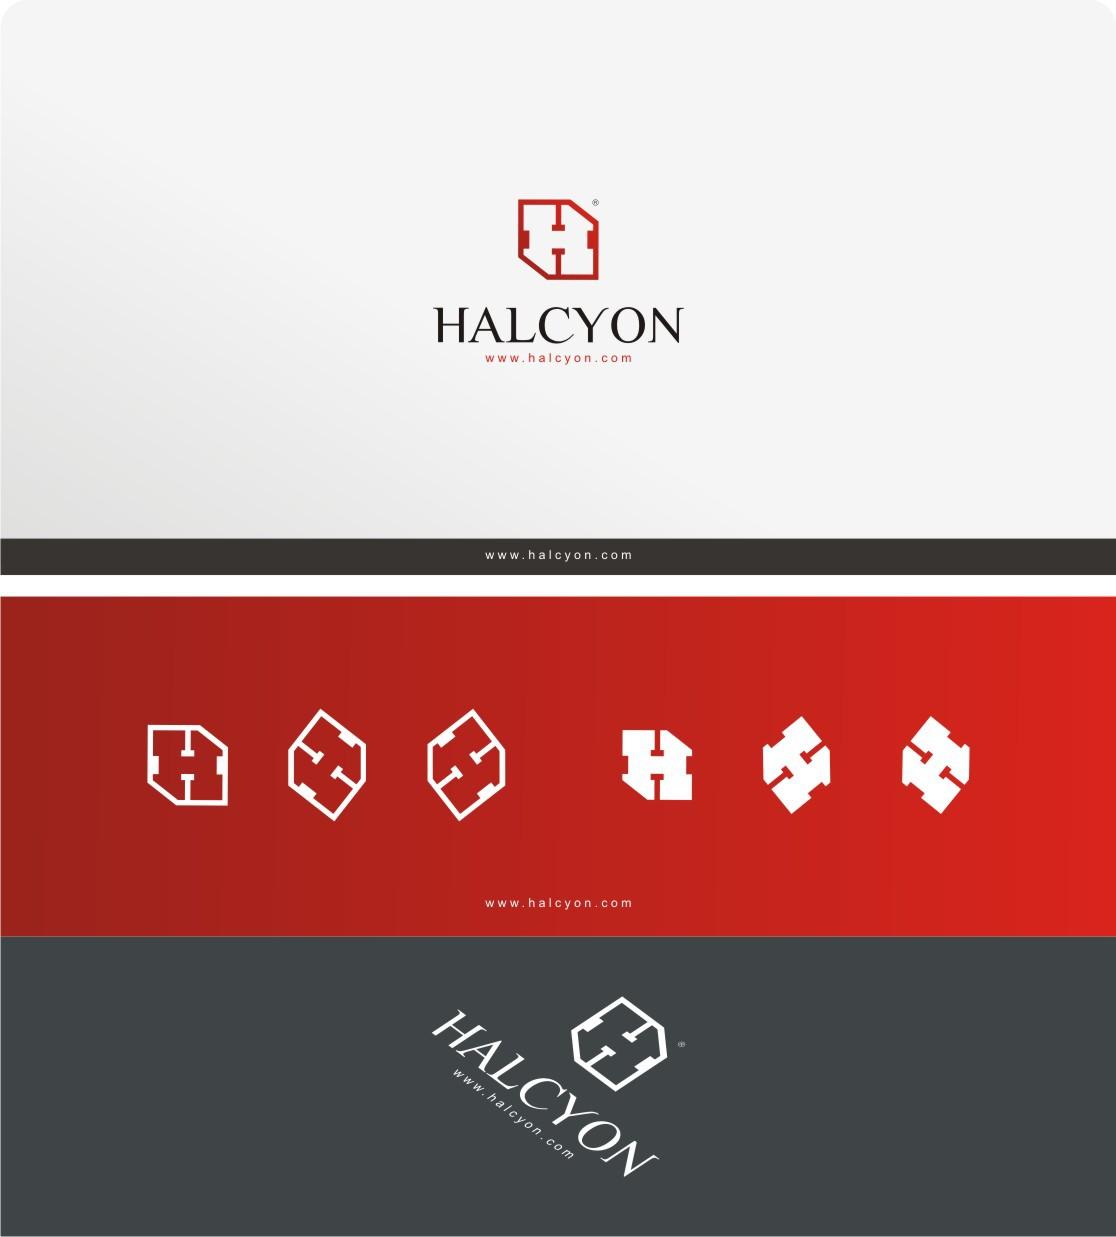 Halcyon needs a new logo